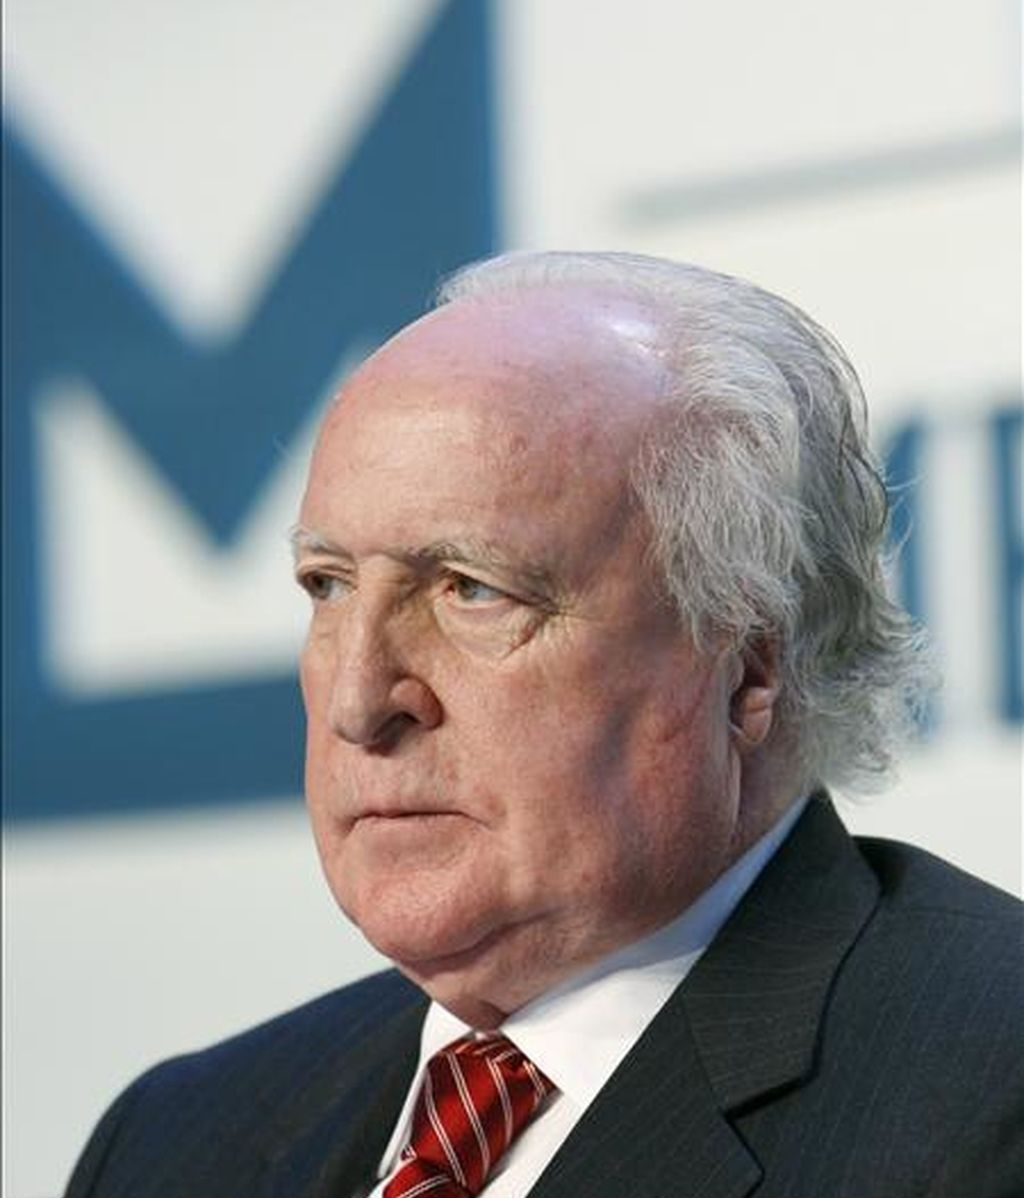 El presidente de Metrovacesa, Ramón Sanahuja. EFE/Archivo